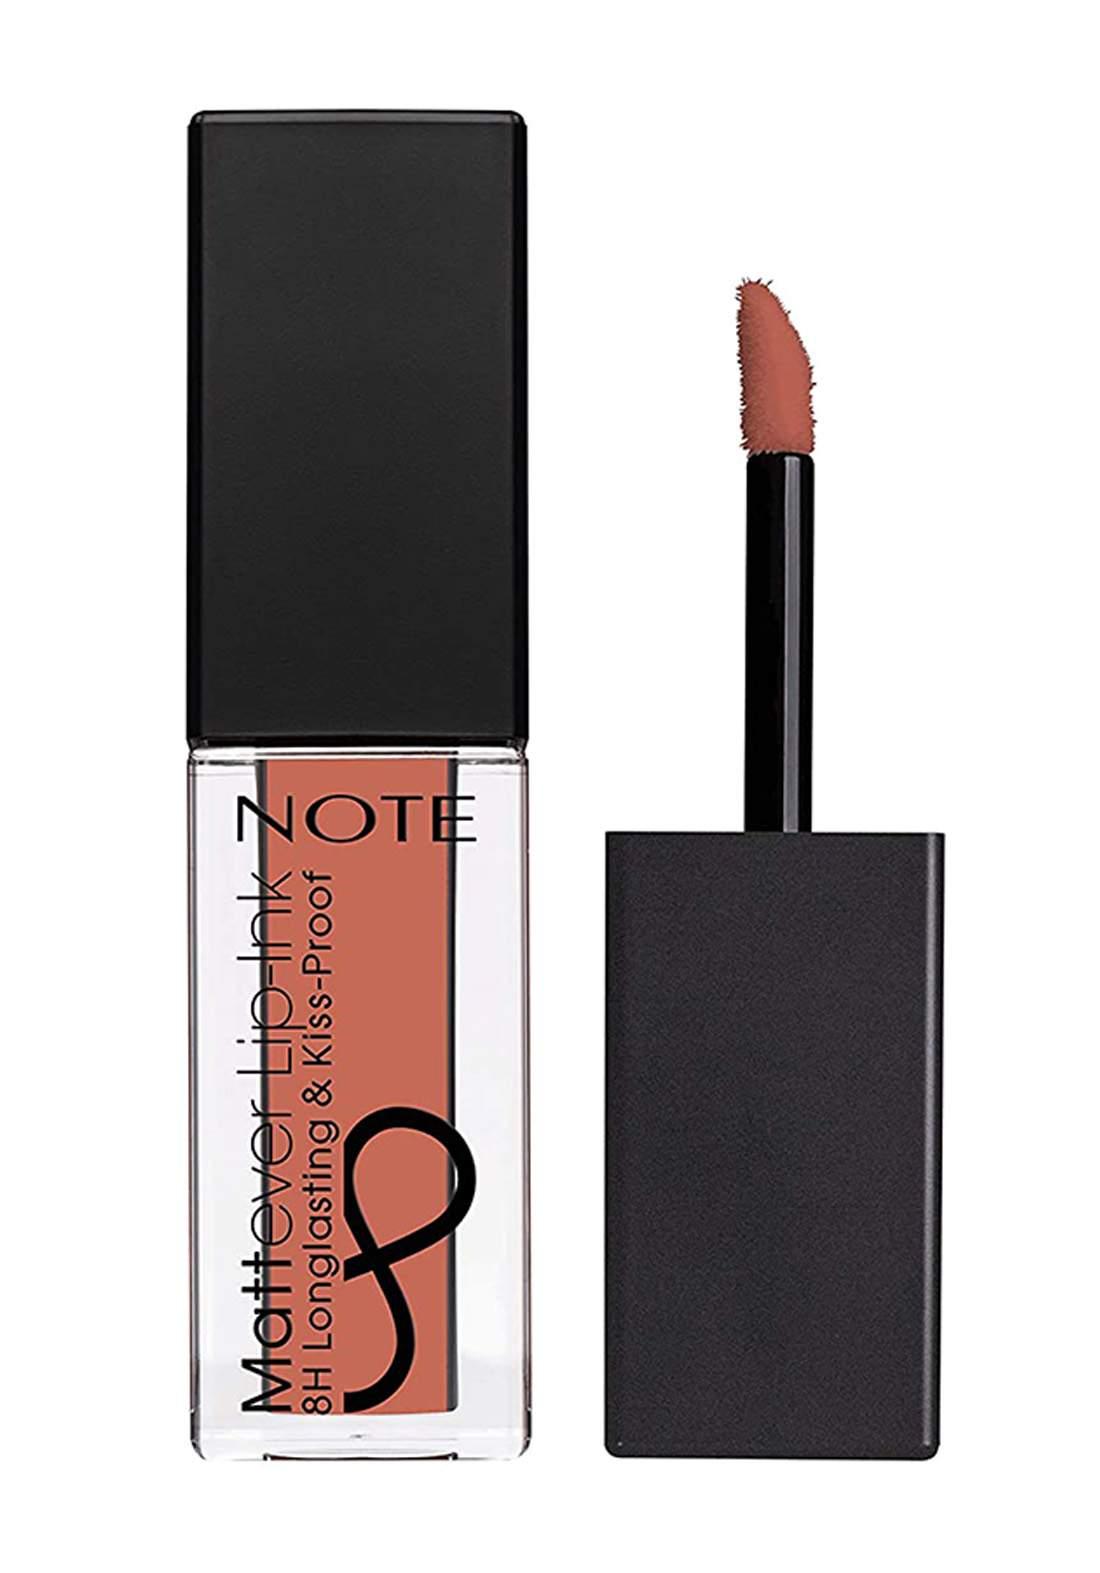 Note Cosmetics Mattever Lip Ink No.05 Toffe Brok 4.5ml احمر شفاه